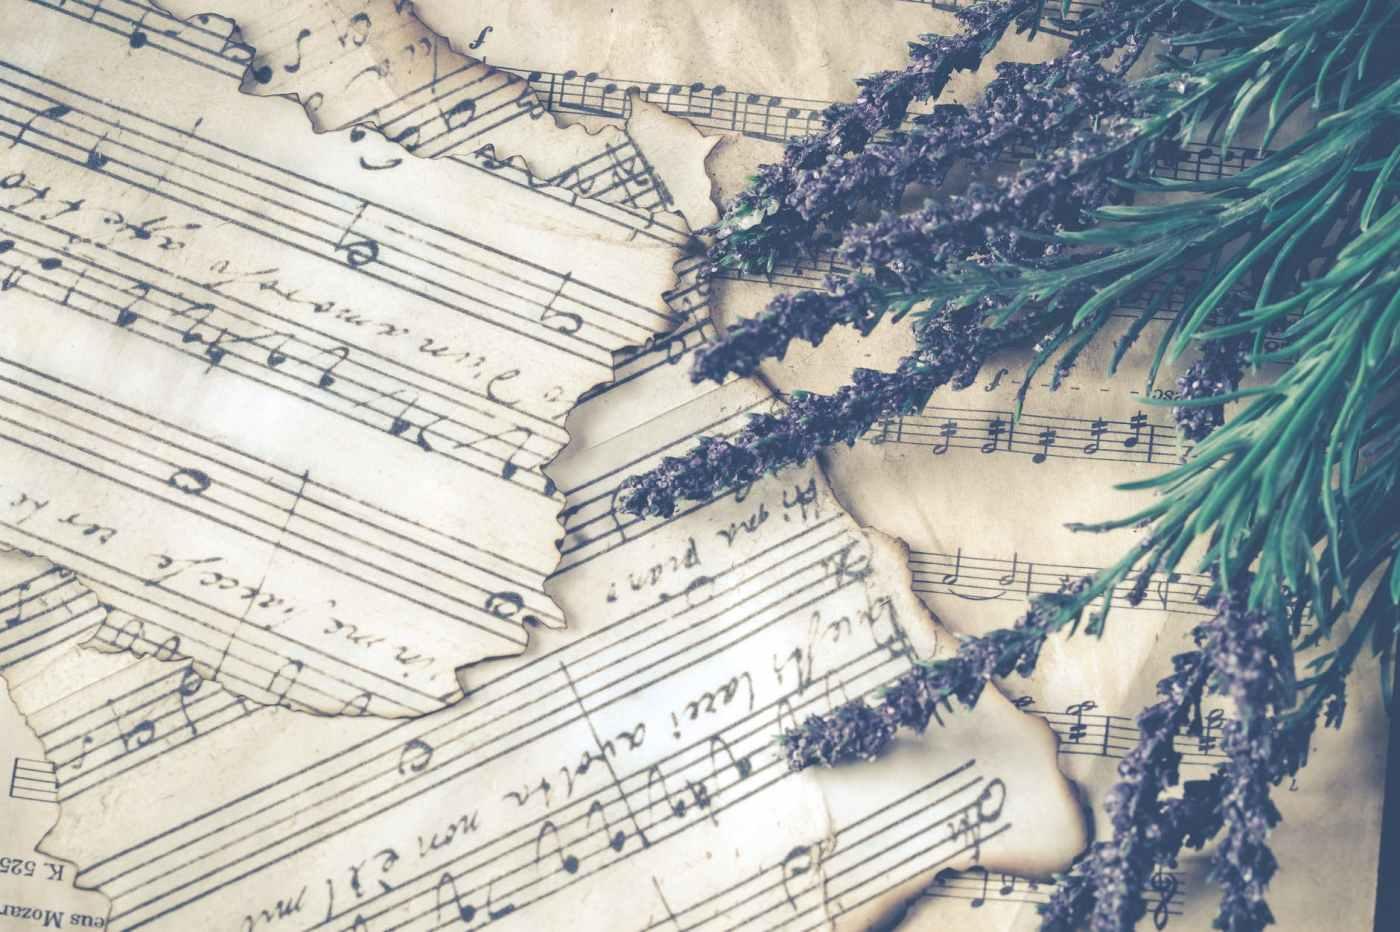 purple lavender over music sheet